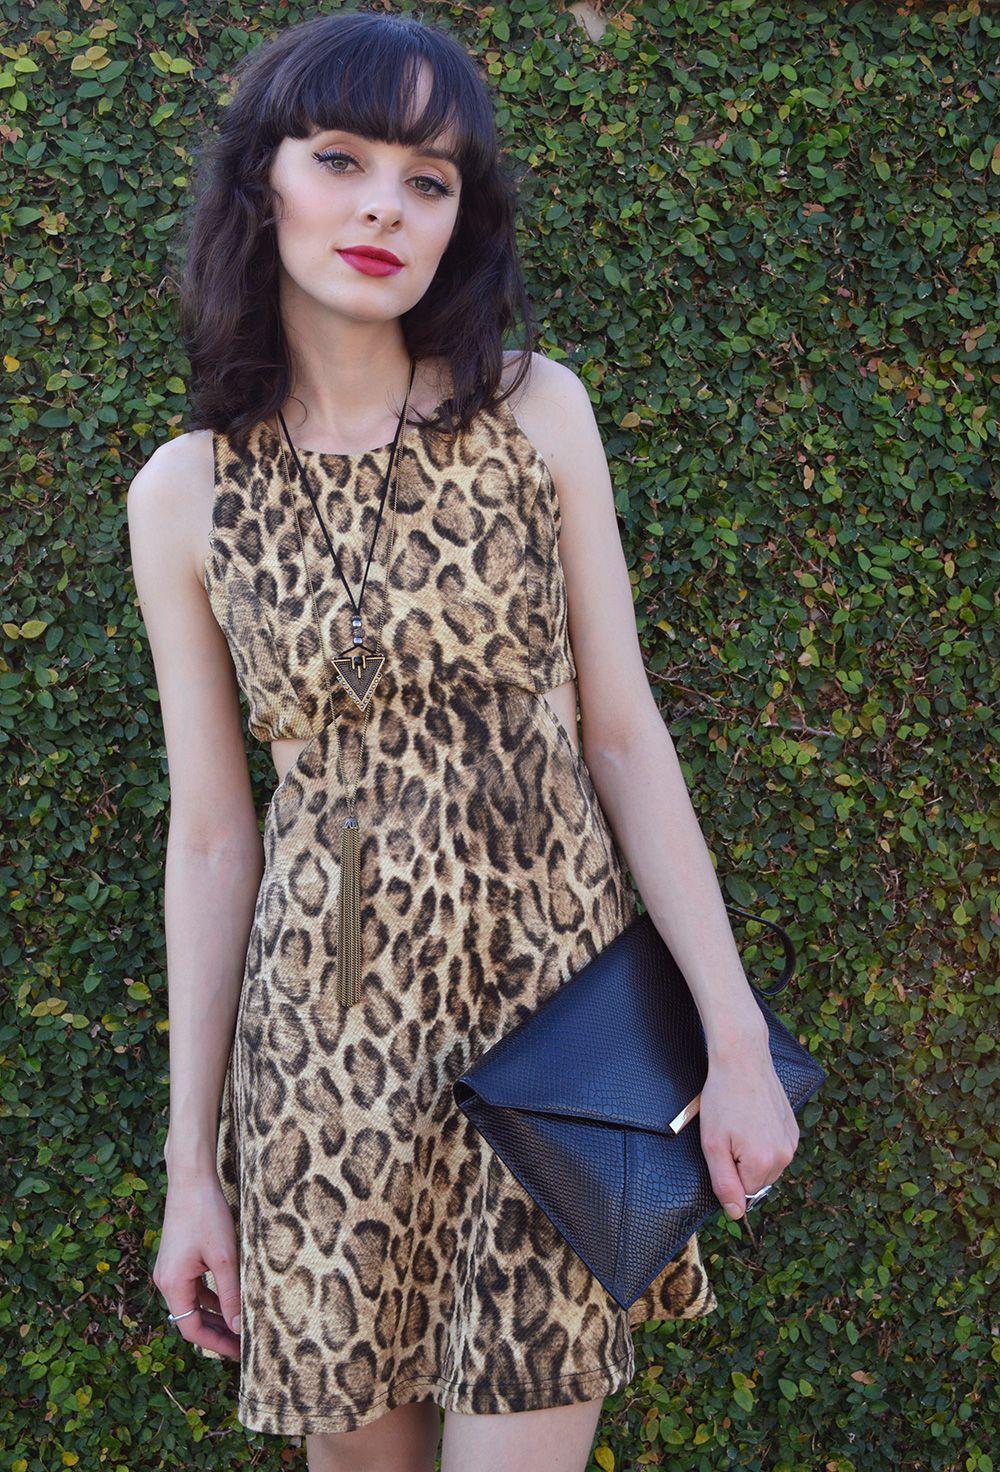 Look Festa Casual com Animal Print - Blog Ela Inspira - http://bit.ly/1Le9JJ3